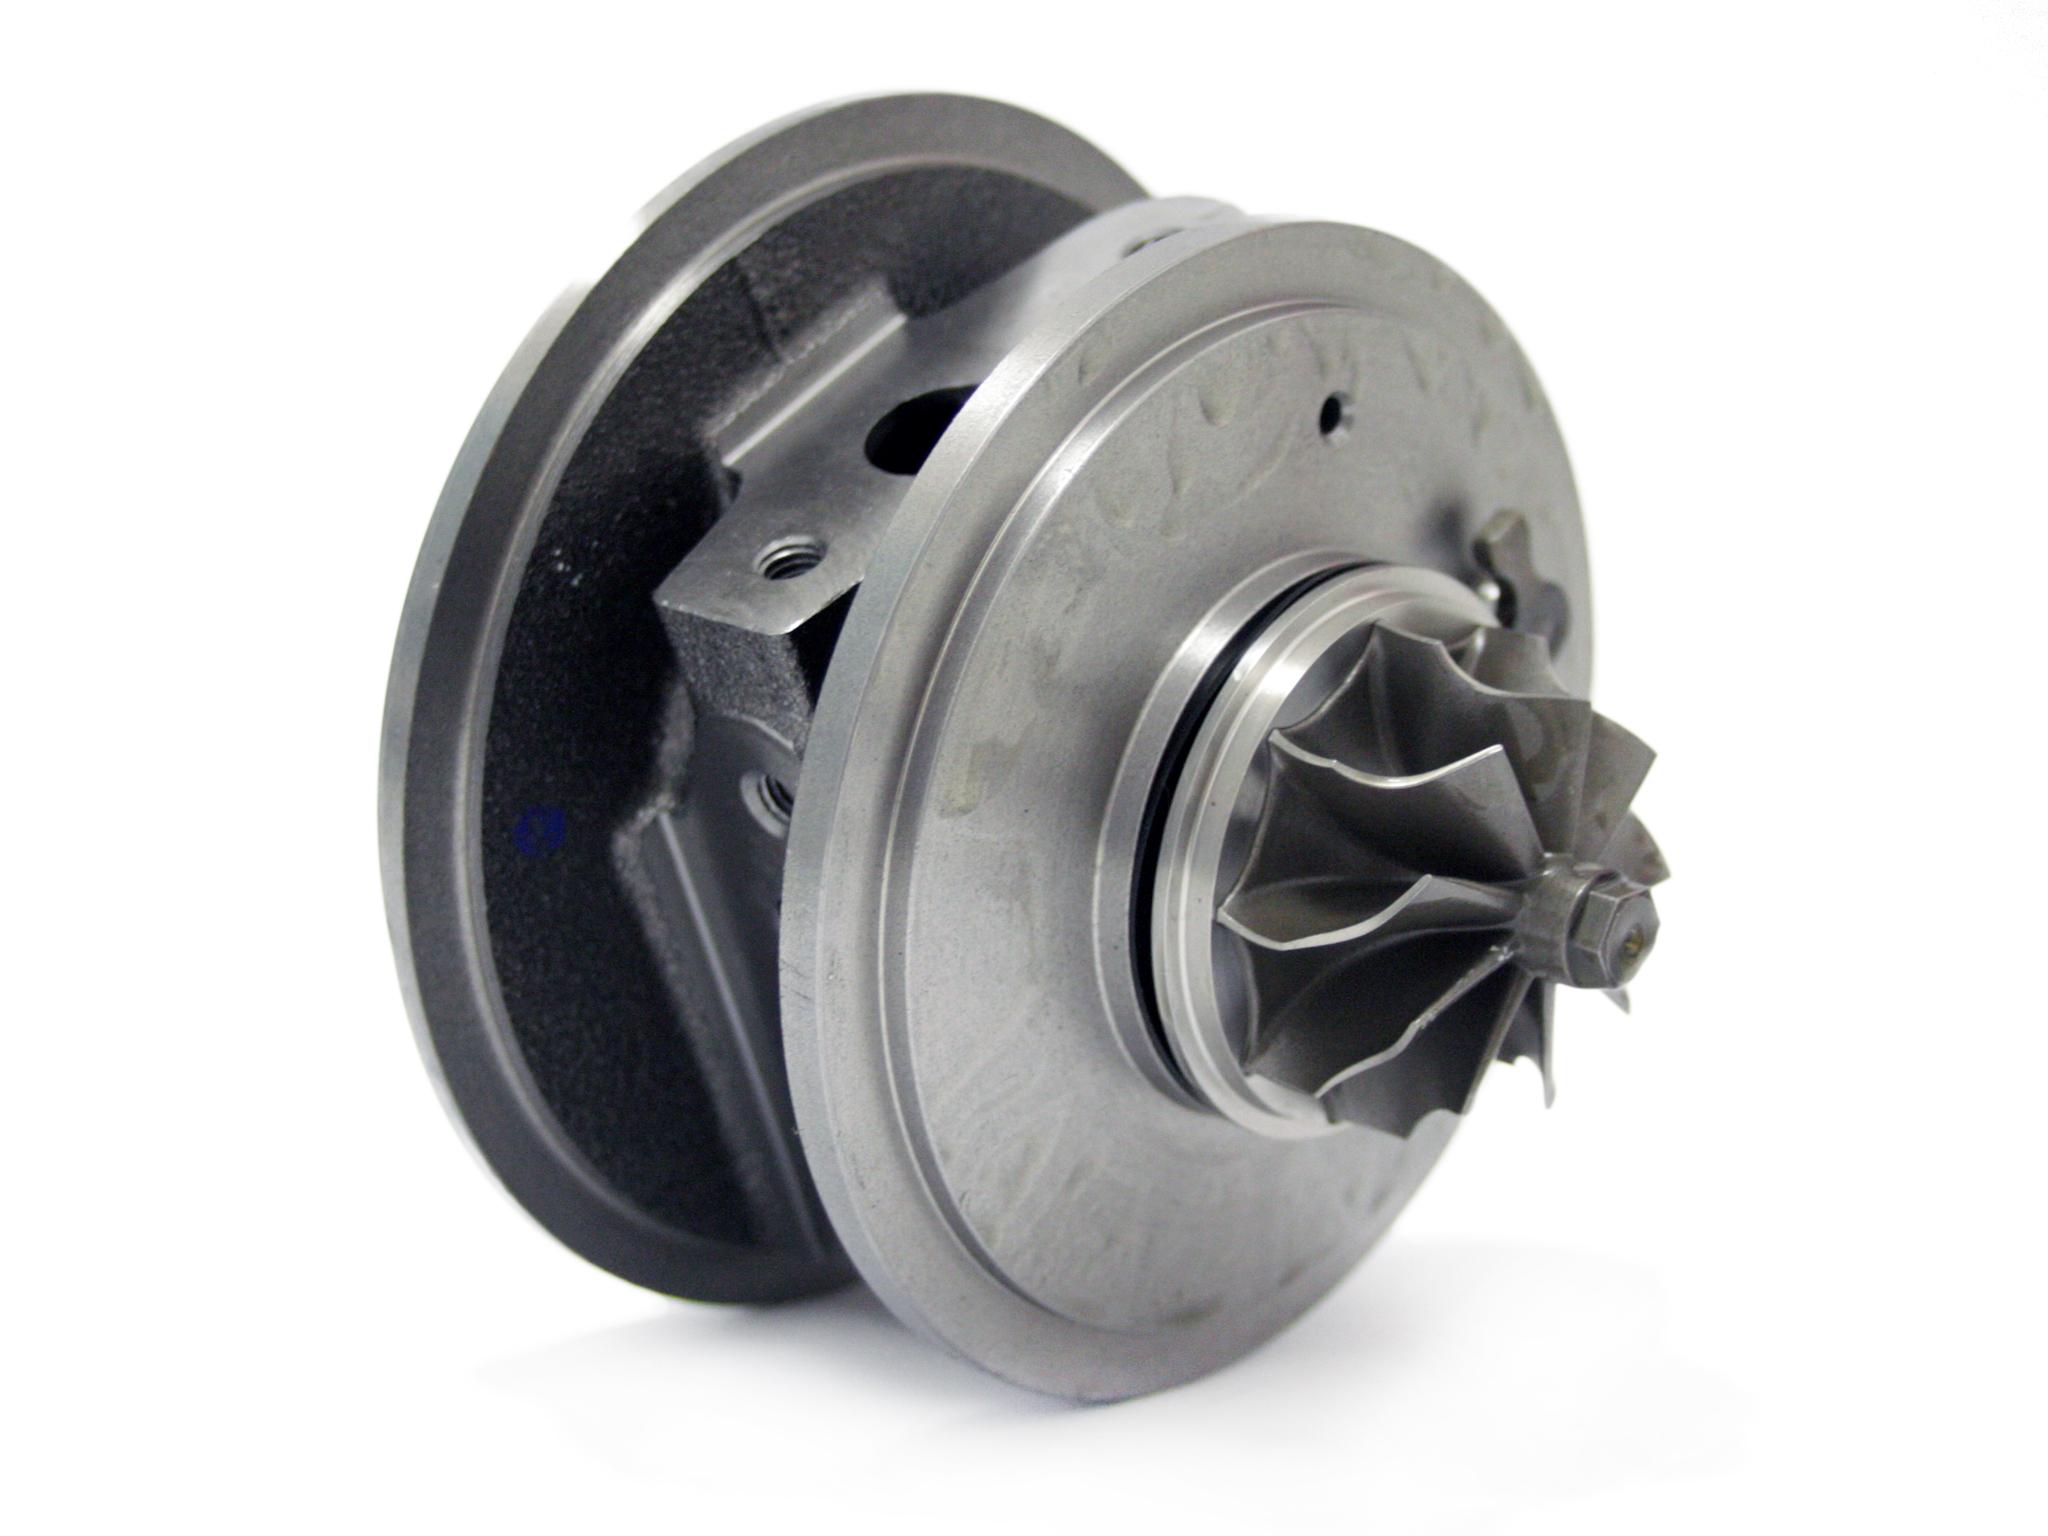 Картридж турбины RHV4 Мазда БТ50 2.5 WLAA 143 л.с.